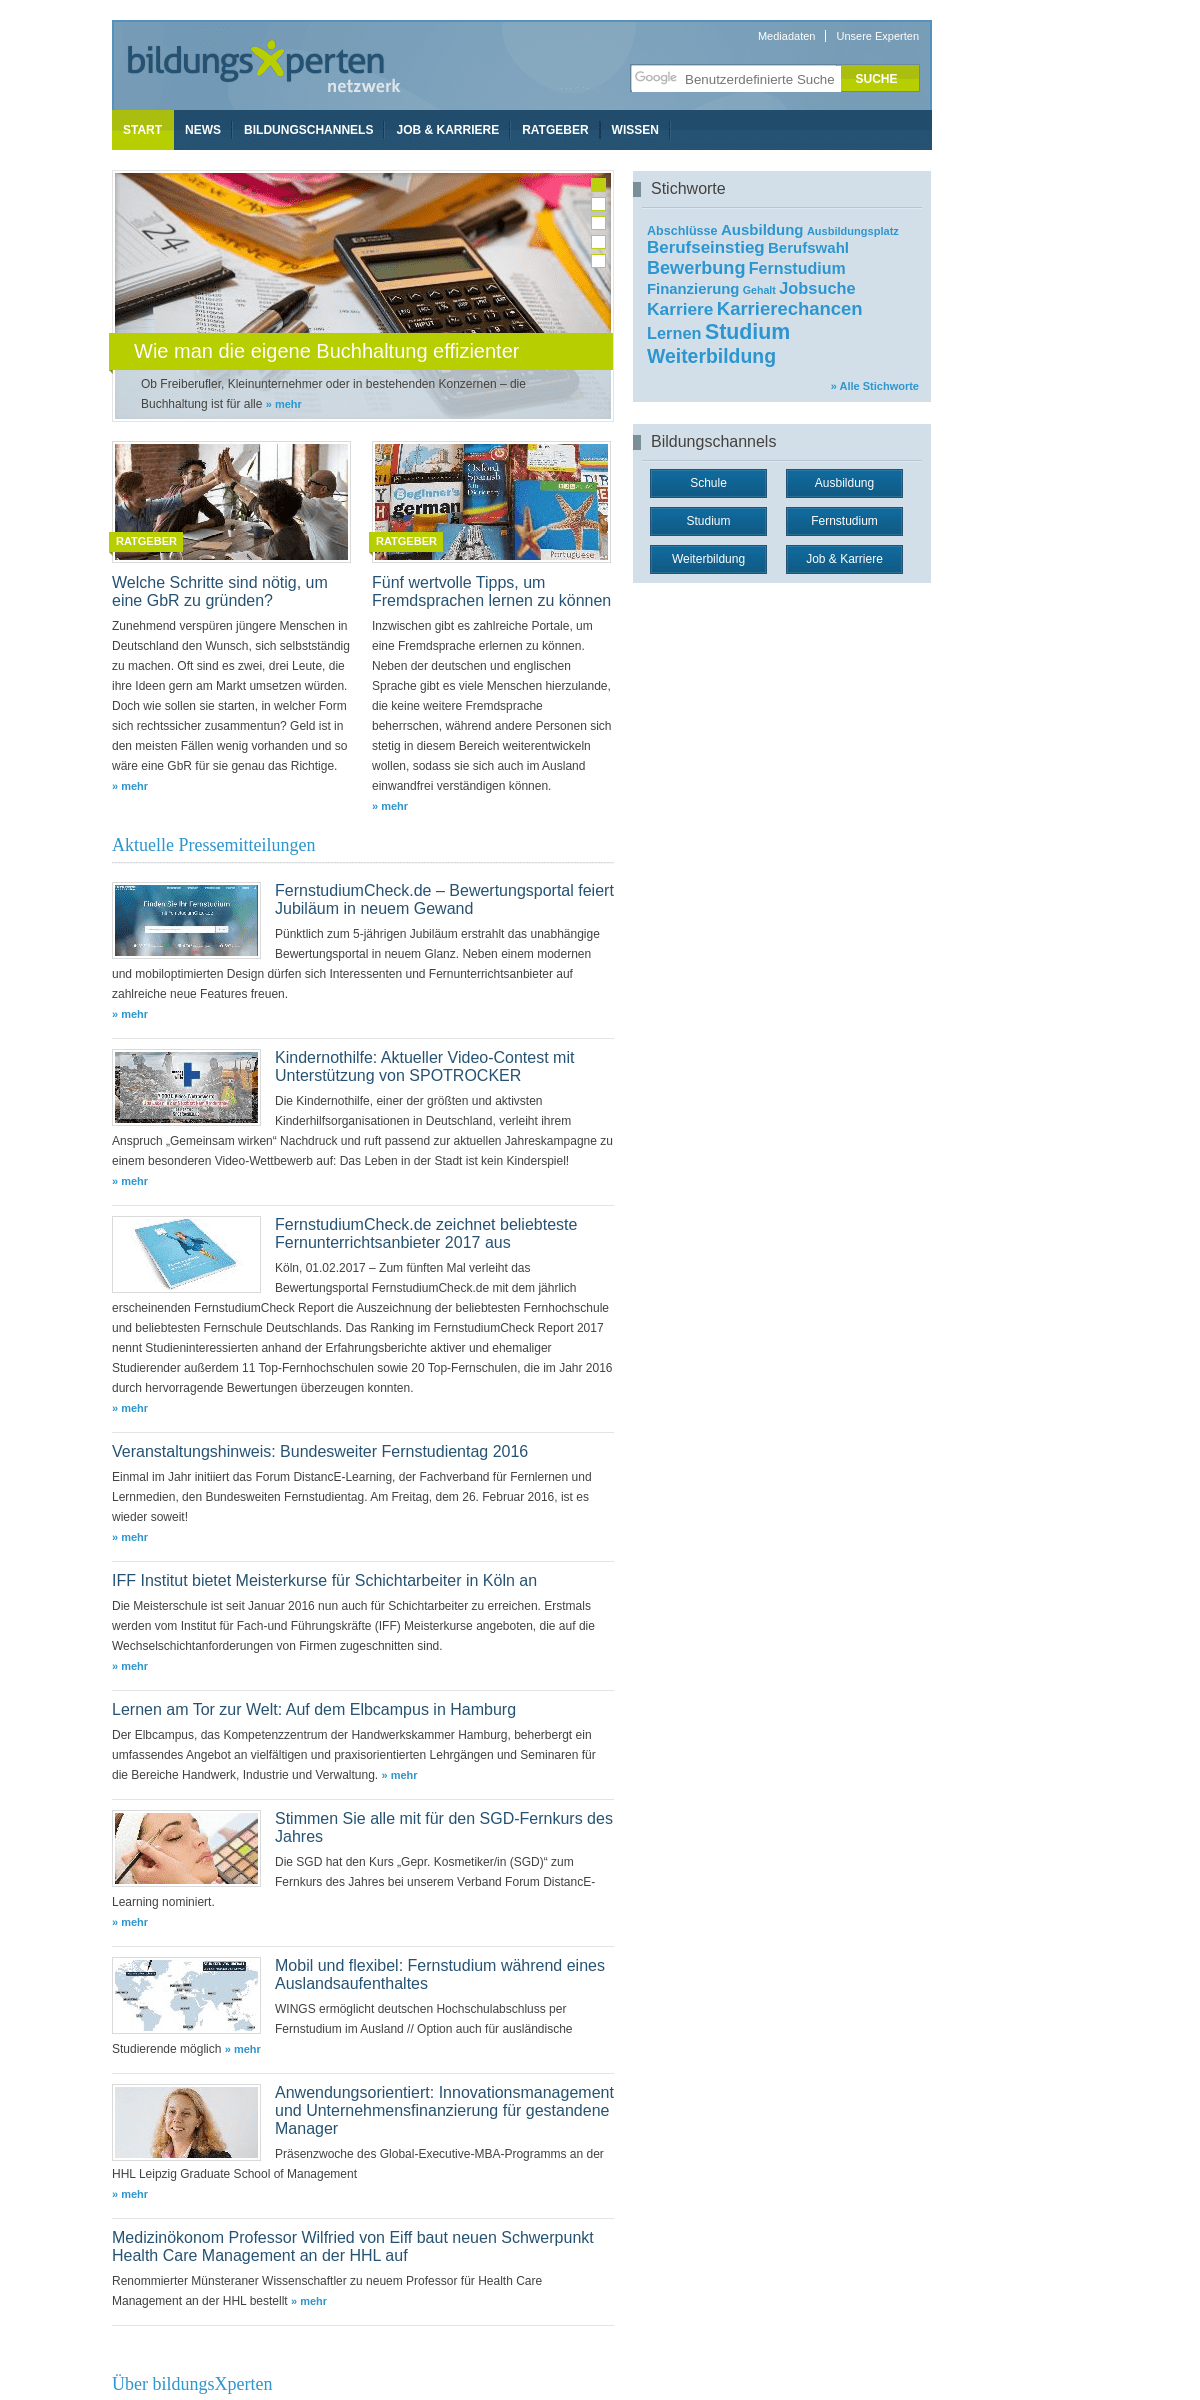 bildungsXperten.net - Das Netzwerk der Bildungsexperten